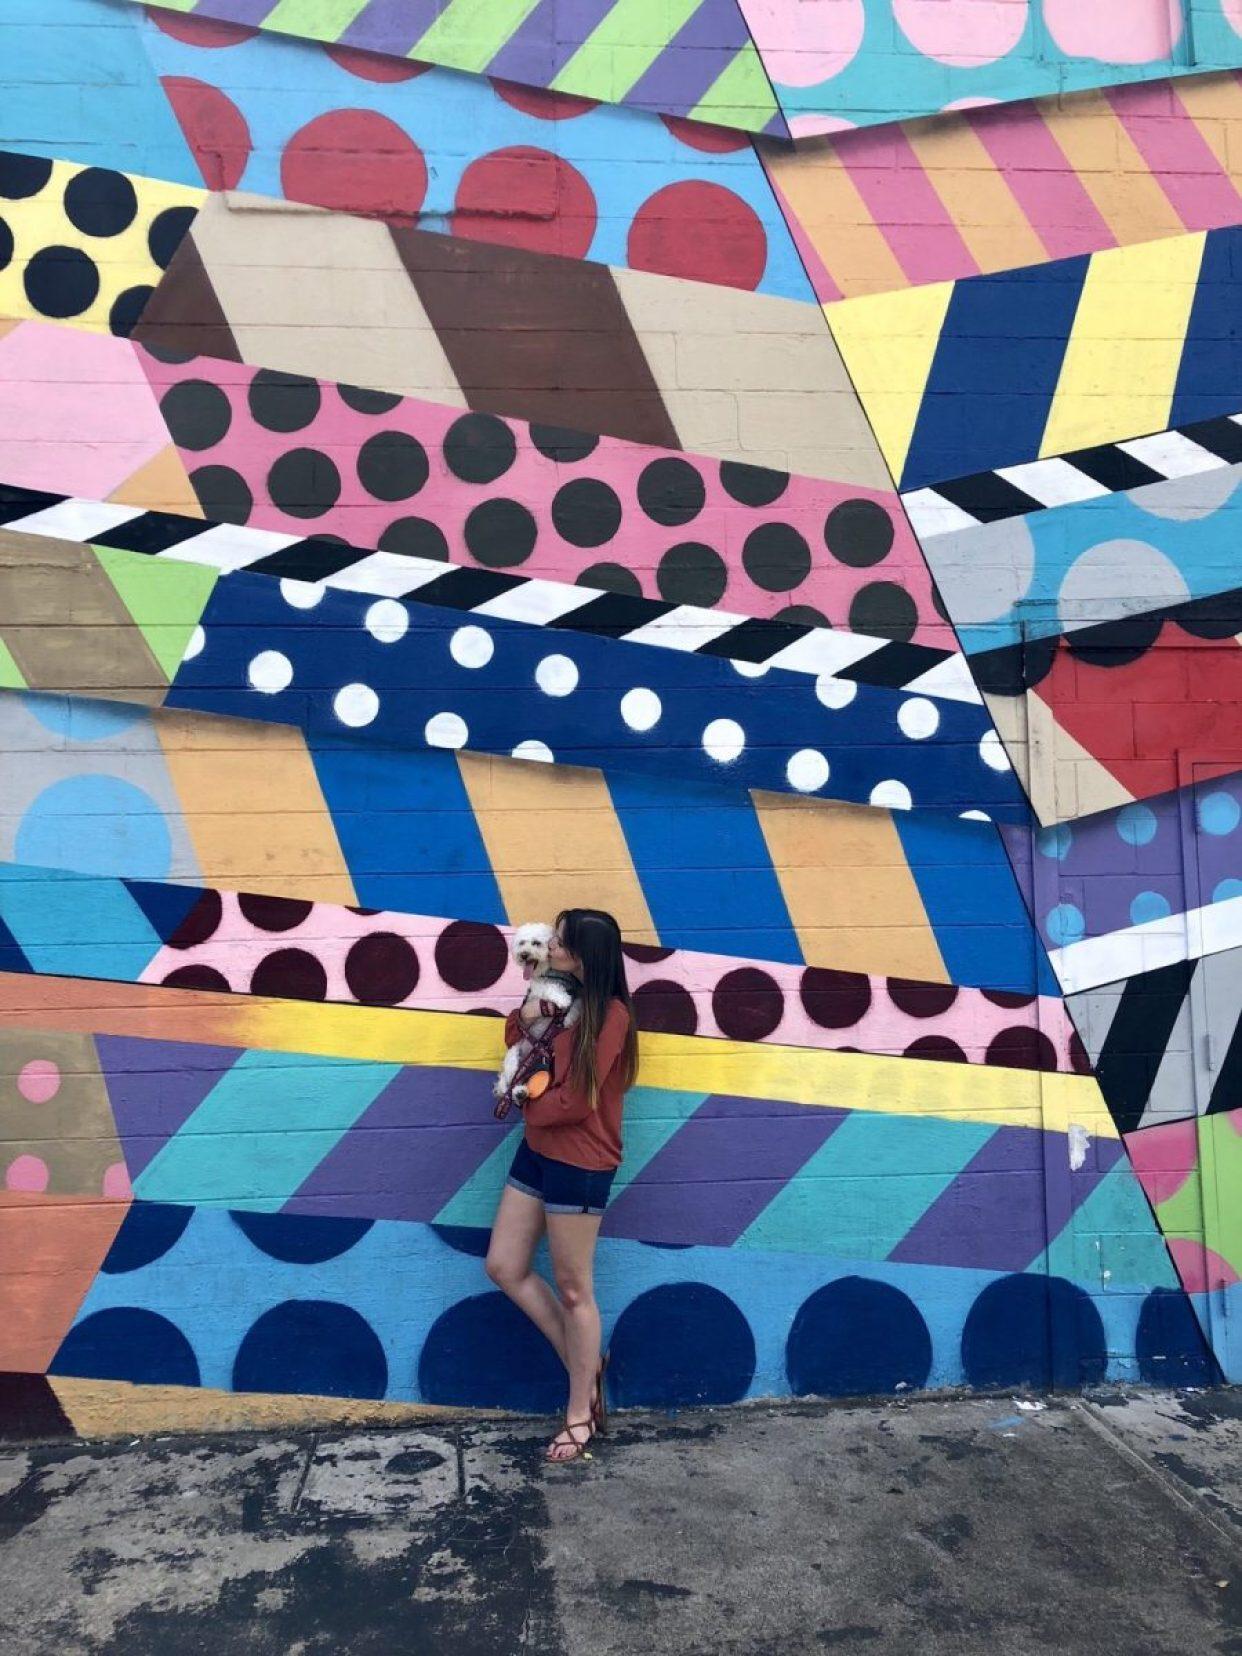 Jason Woodside Mural | The Instagrammers Guide to Nashville Murals